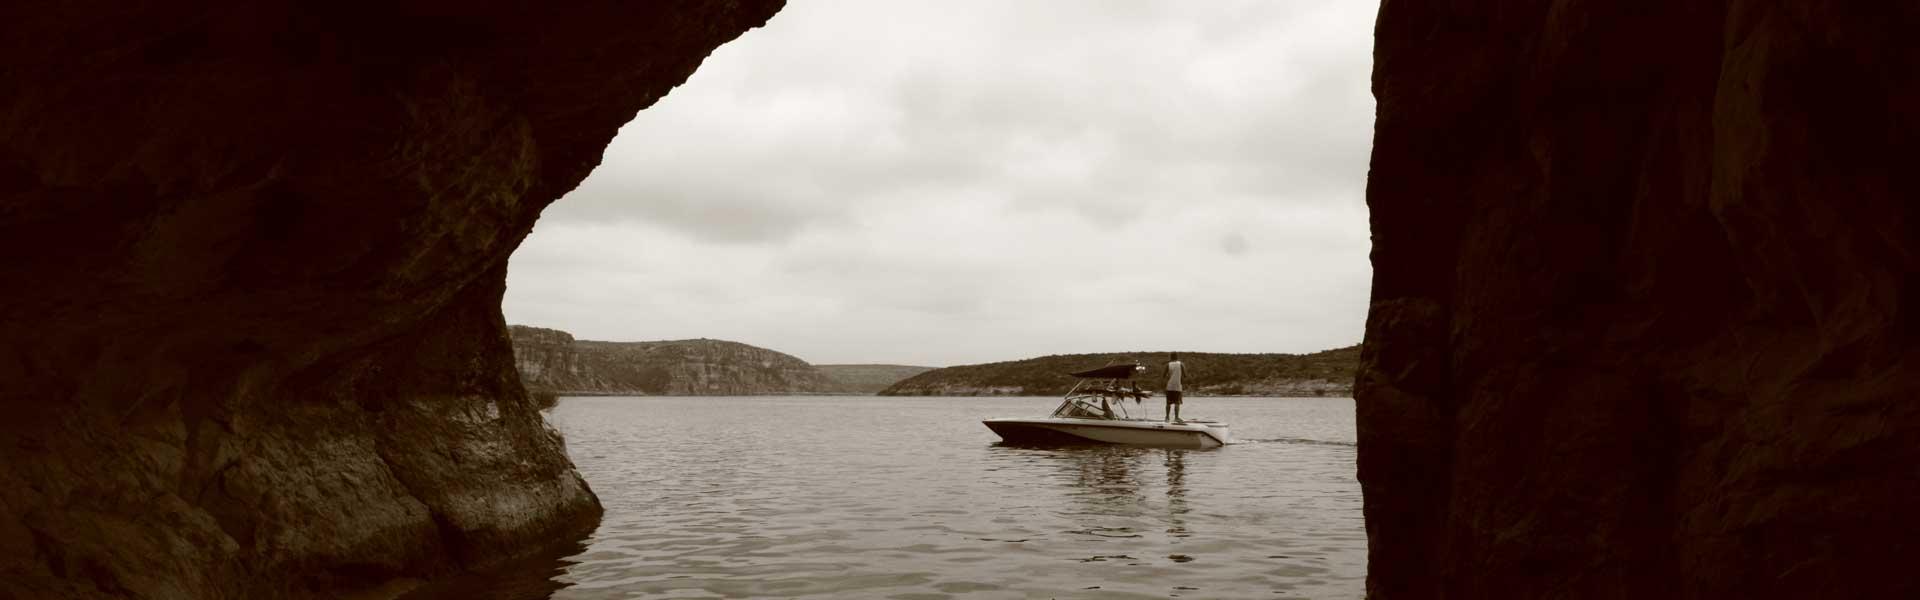 Attrayant Lake Amistad Rentals :: Lake Amistad Rentals